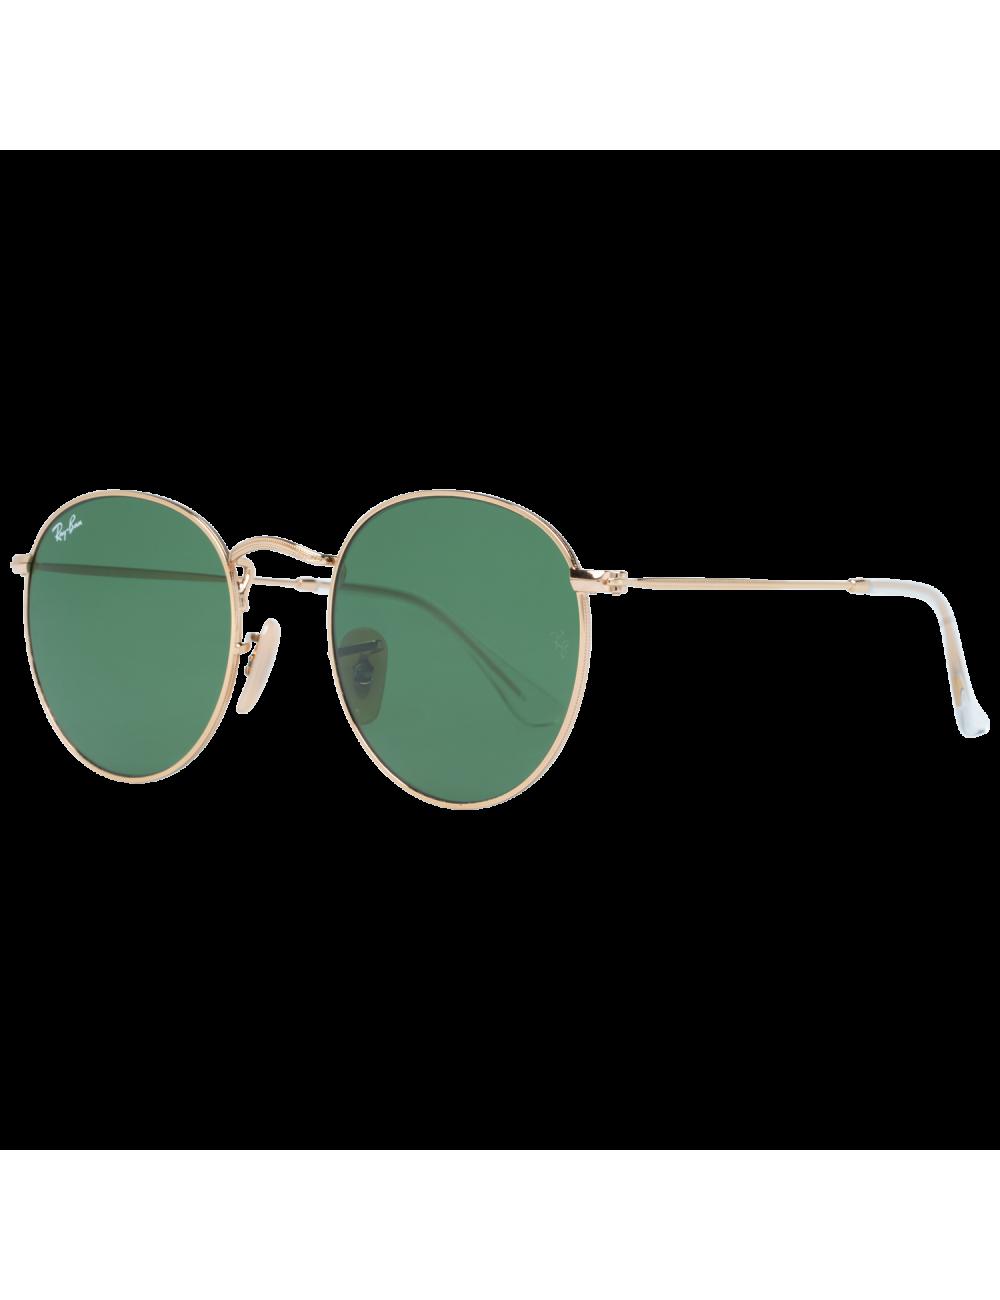 Ray-Ban Sunglasses RB3447 001 50 Round